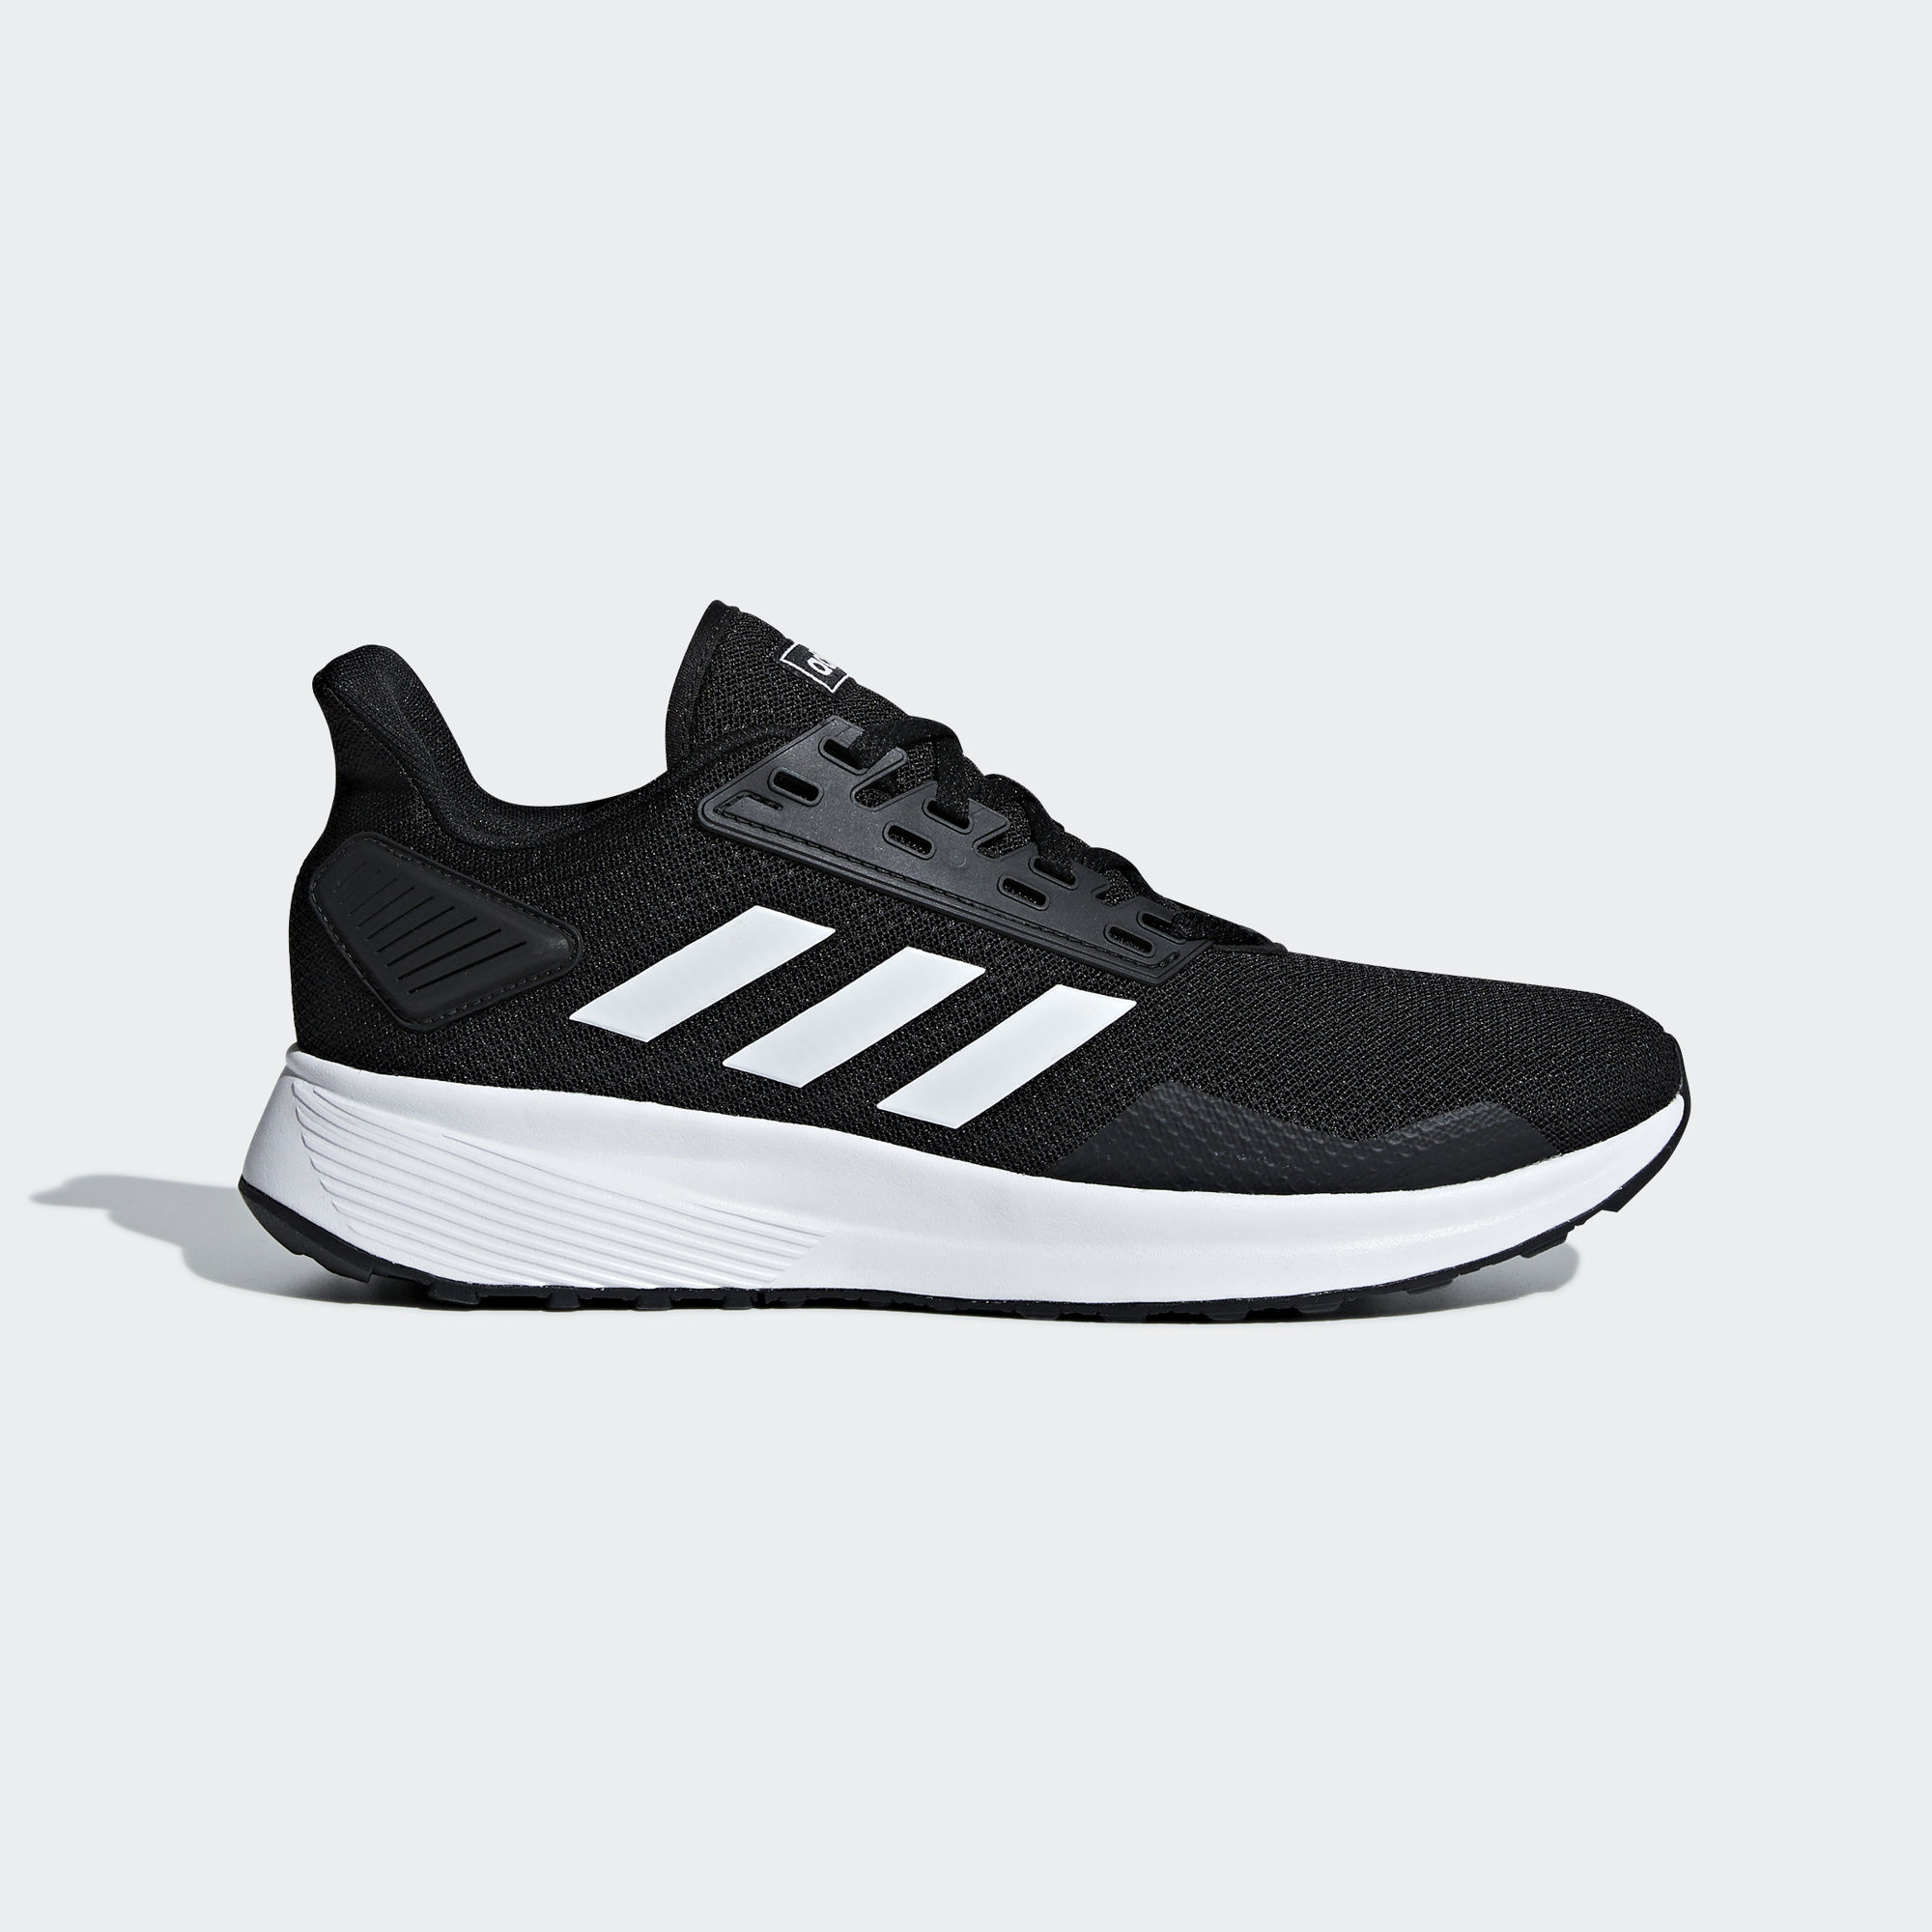 BB7066 Adidas Duramo 9